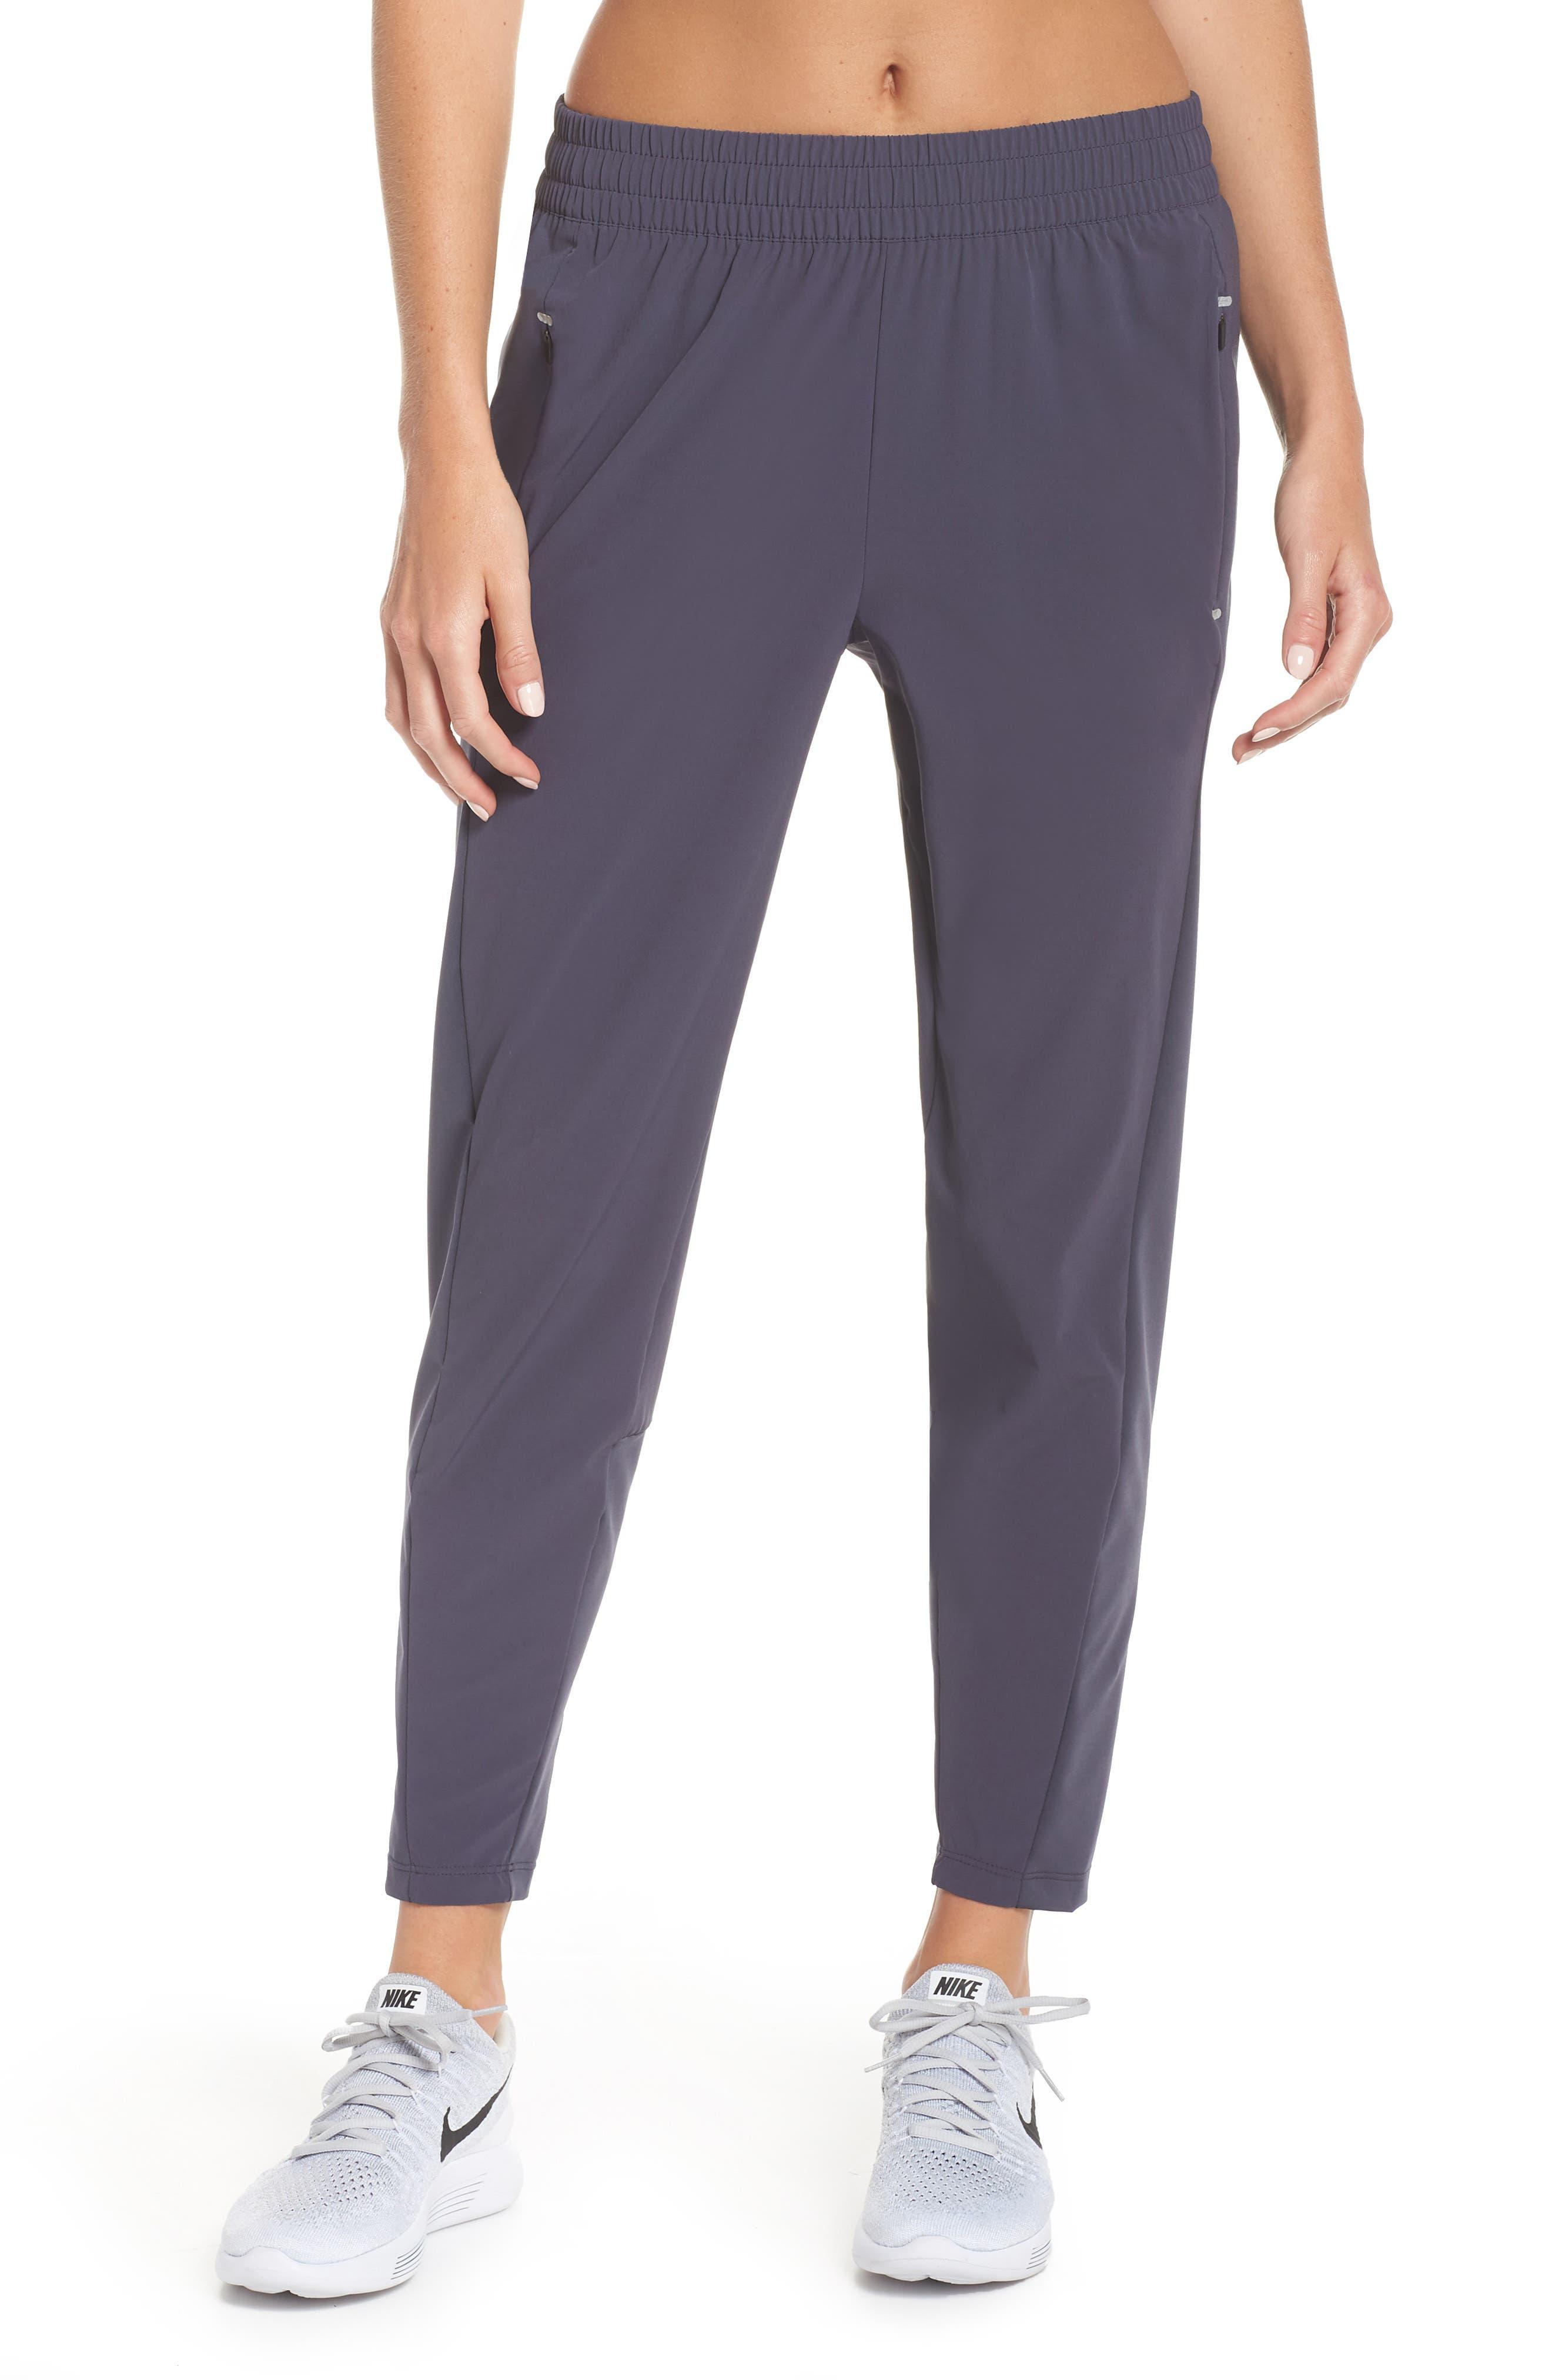 Swift Running Pants,                         Main,                         color, GRIDIRON/ GRIDIRON